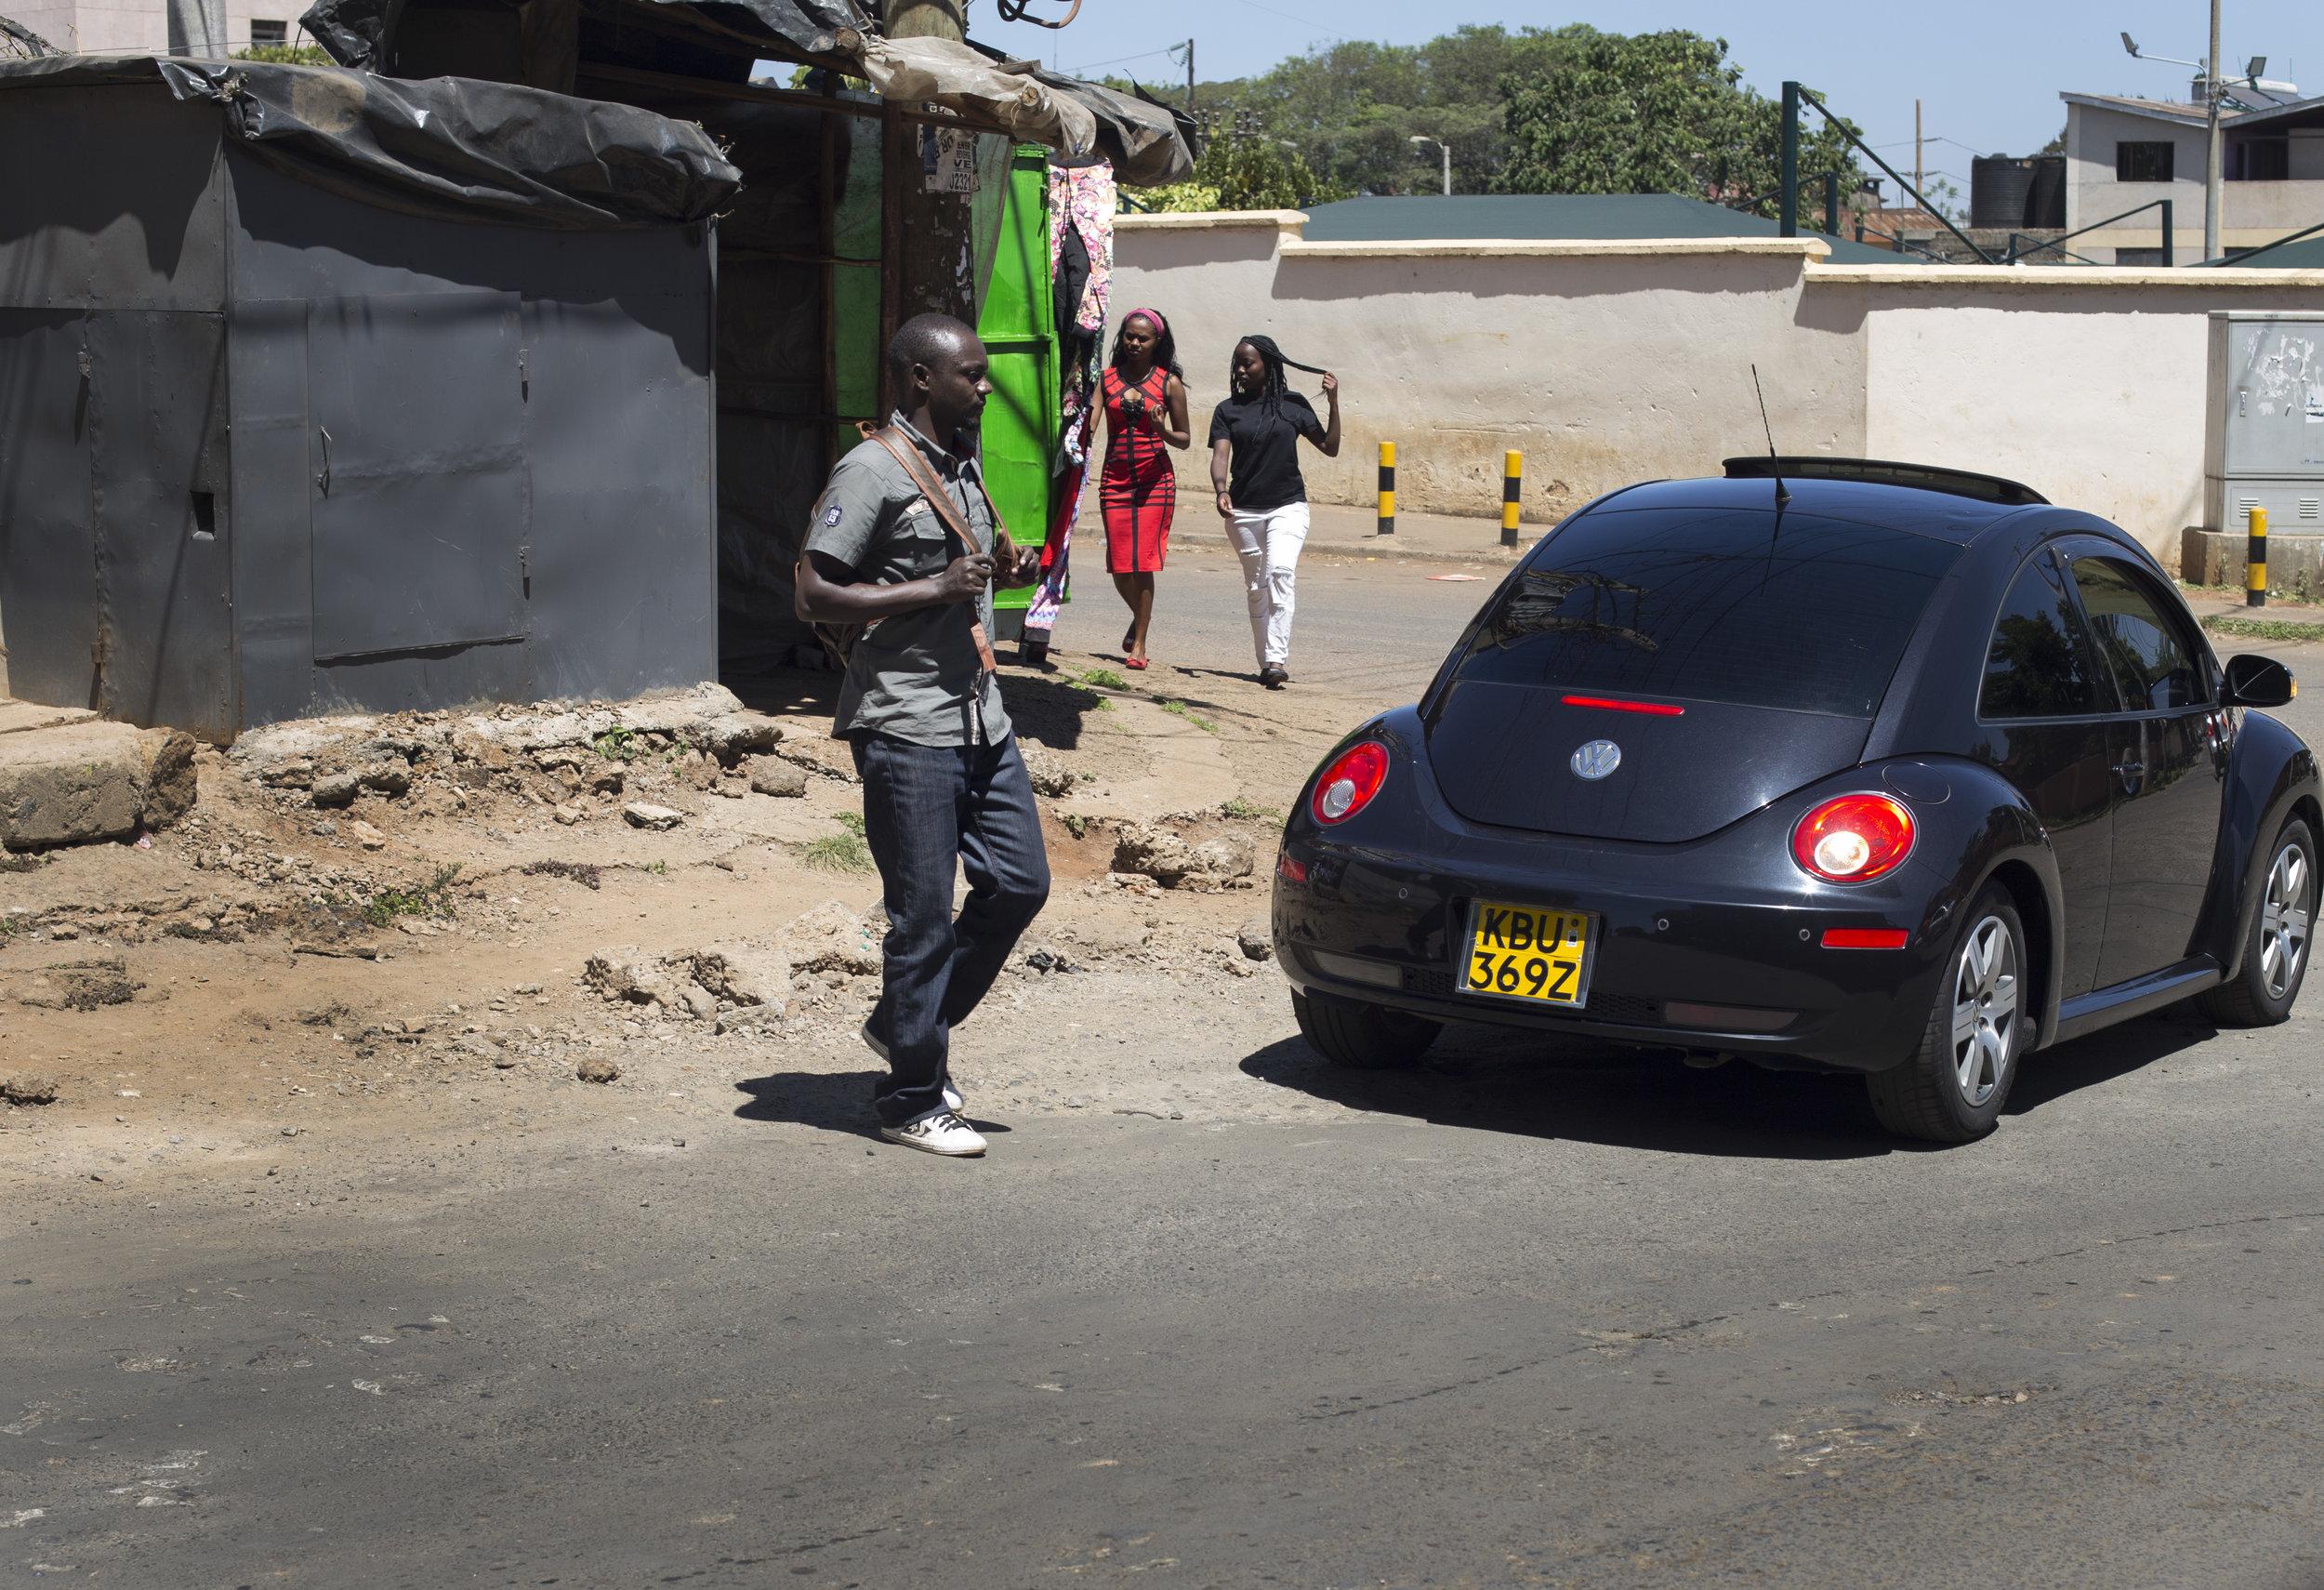 Nairobi_0018.JPG